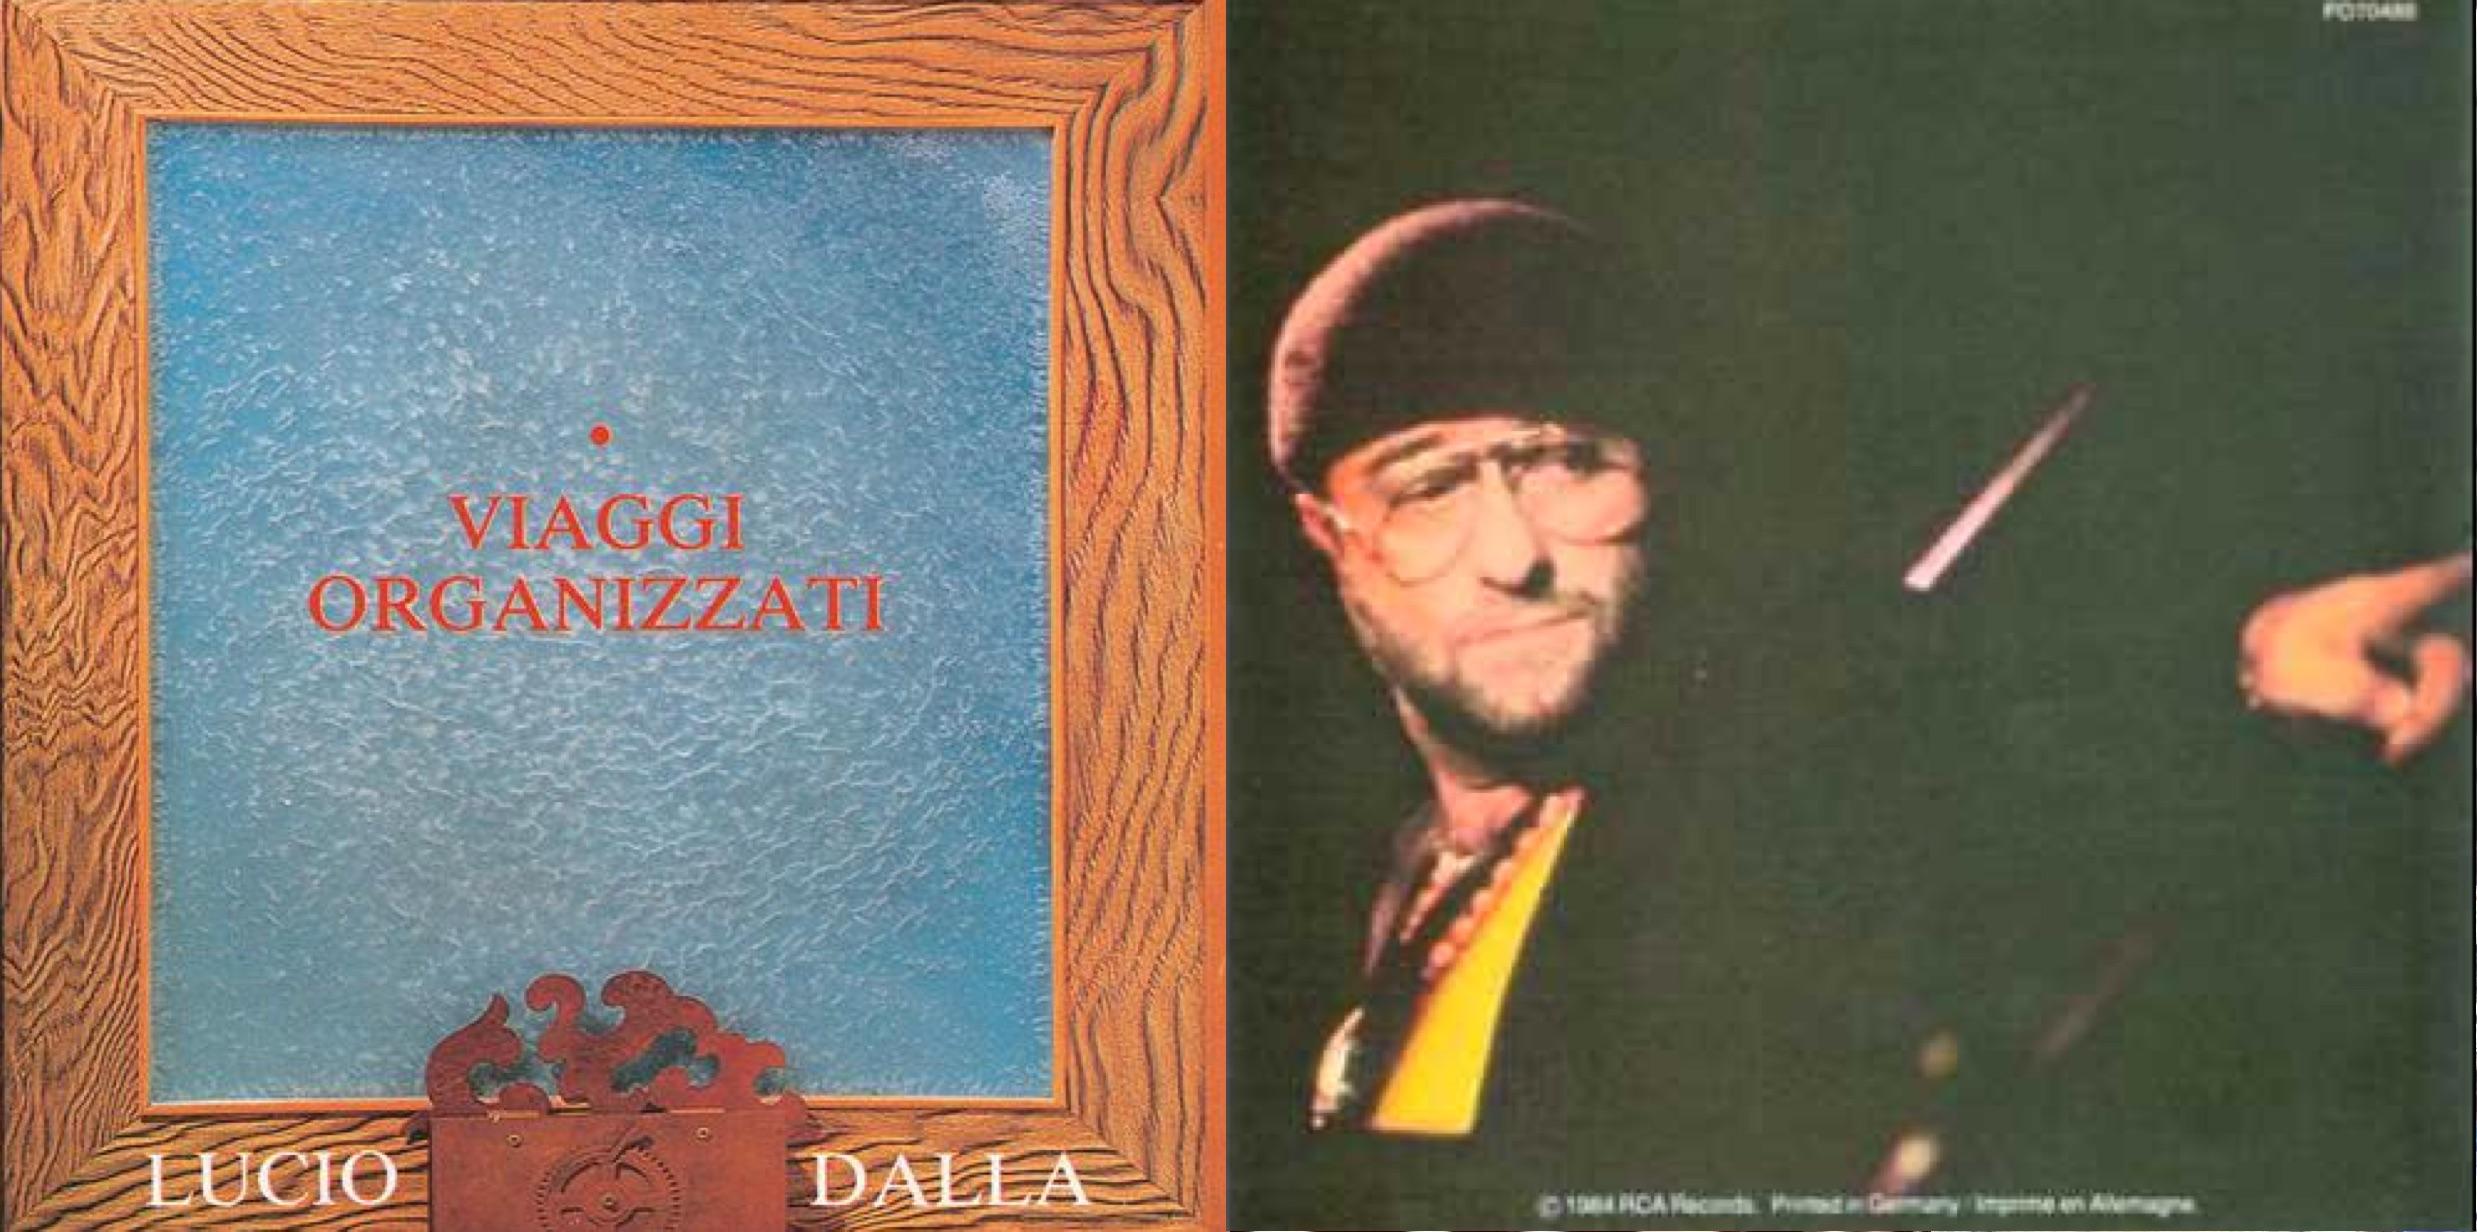 """Viaggi organizzati"", álbum de 1984 que incluyó ""Tutta la vita""."